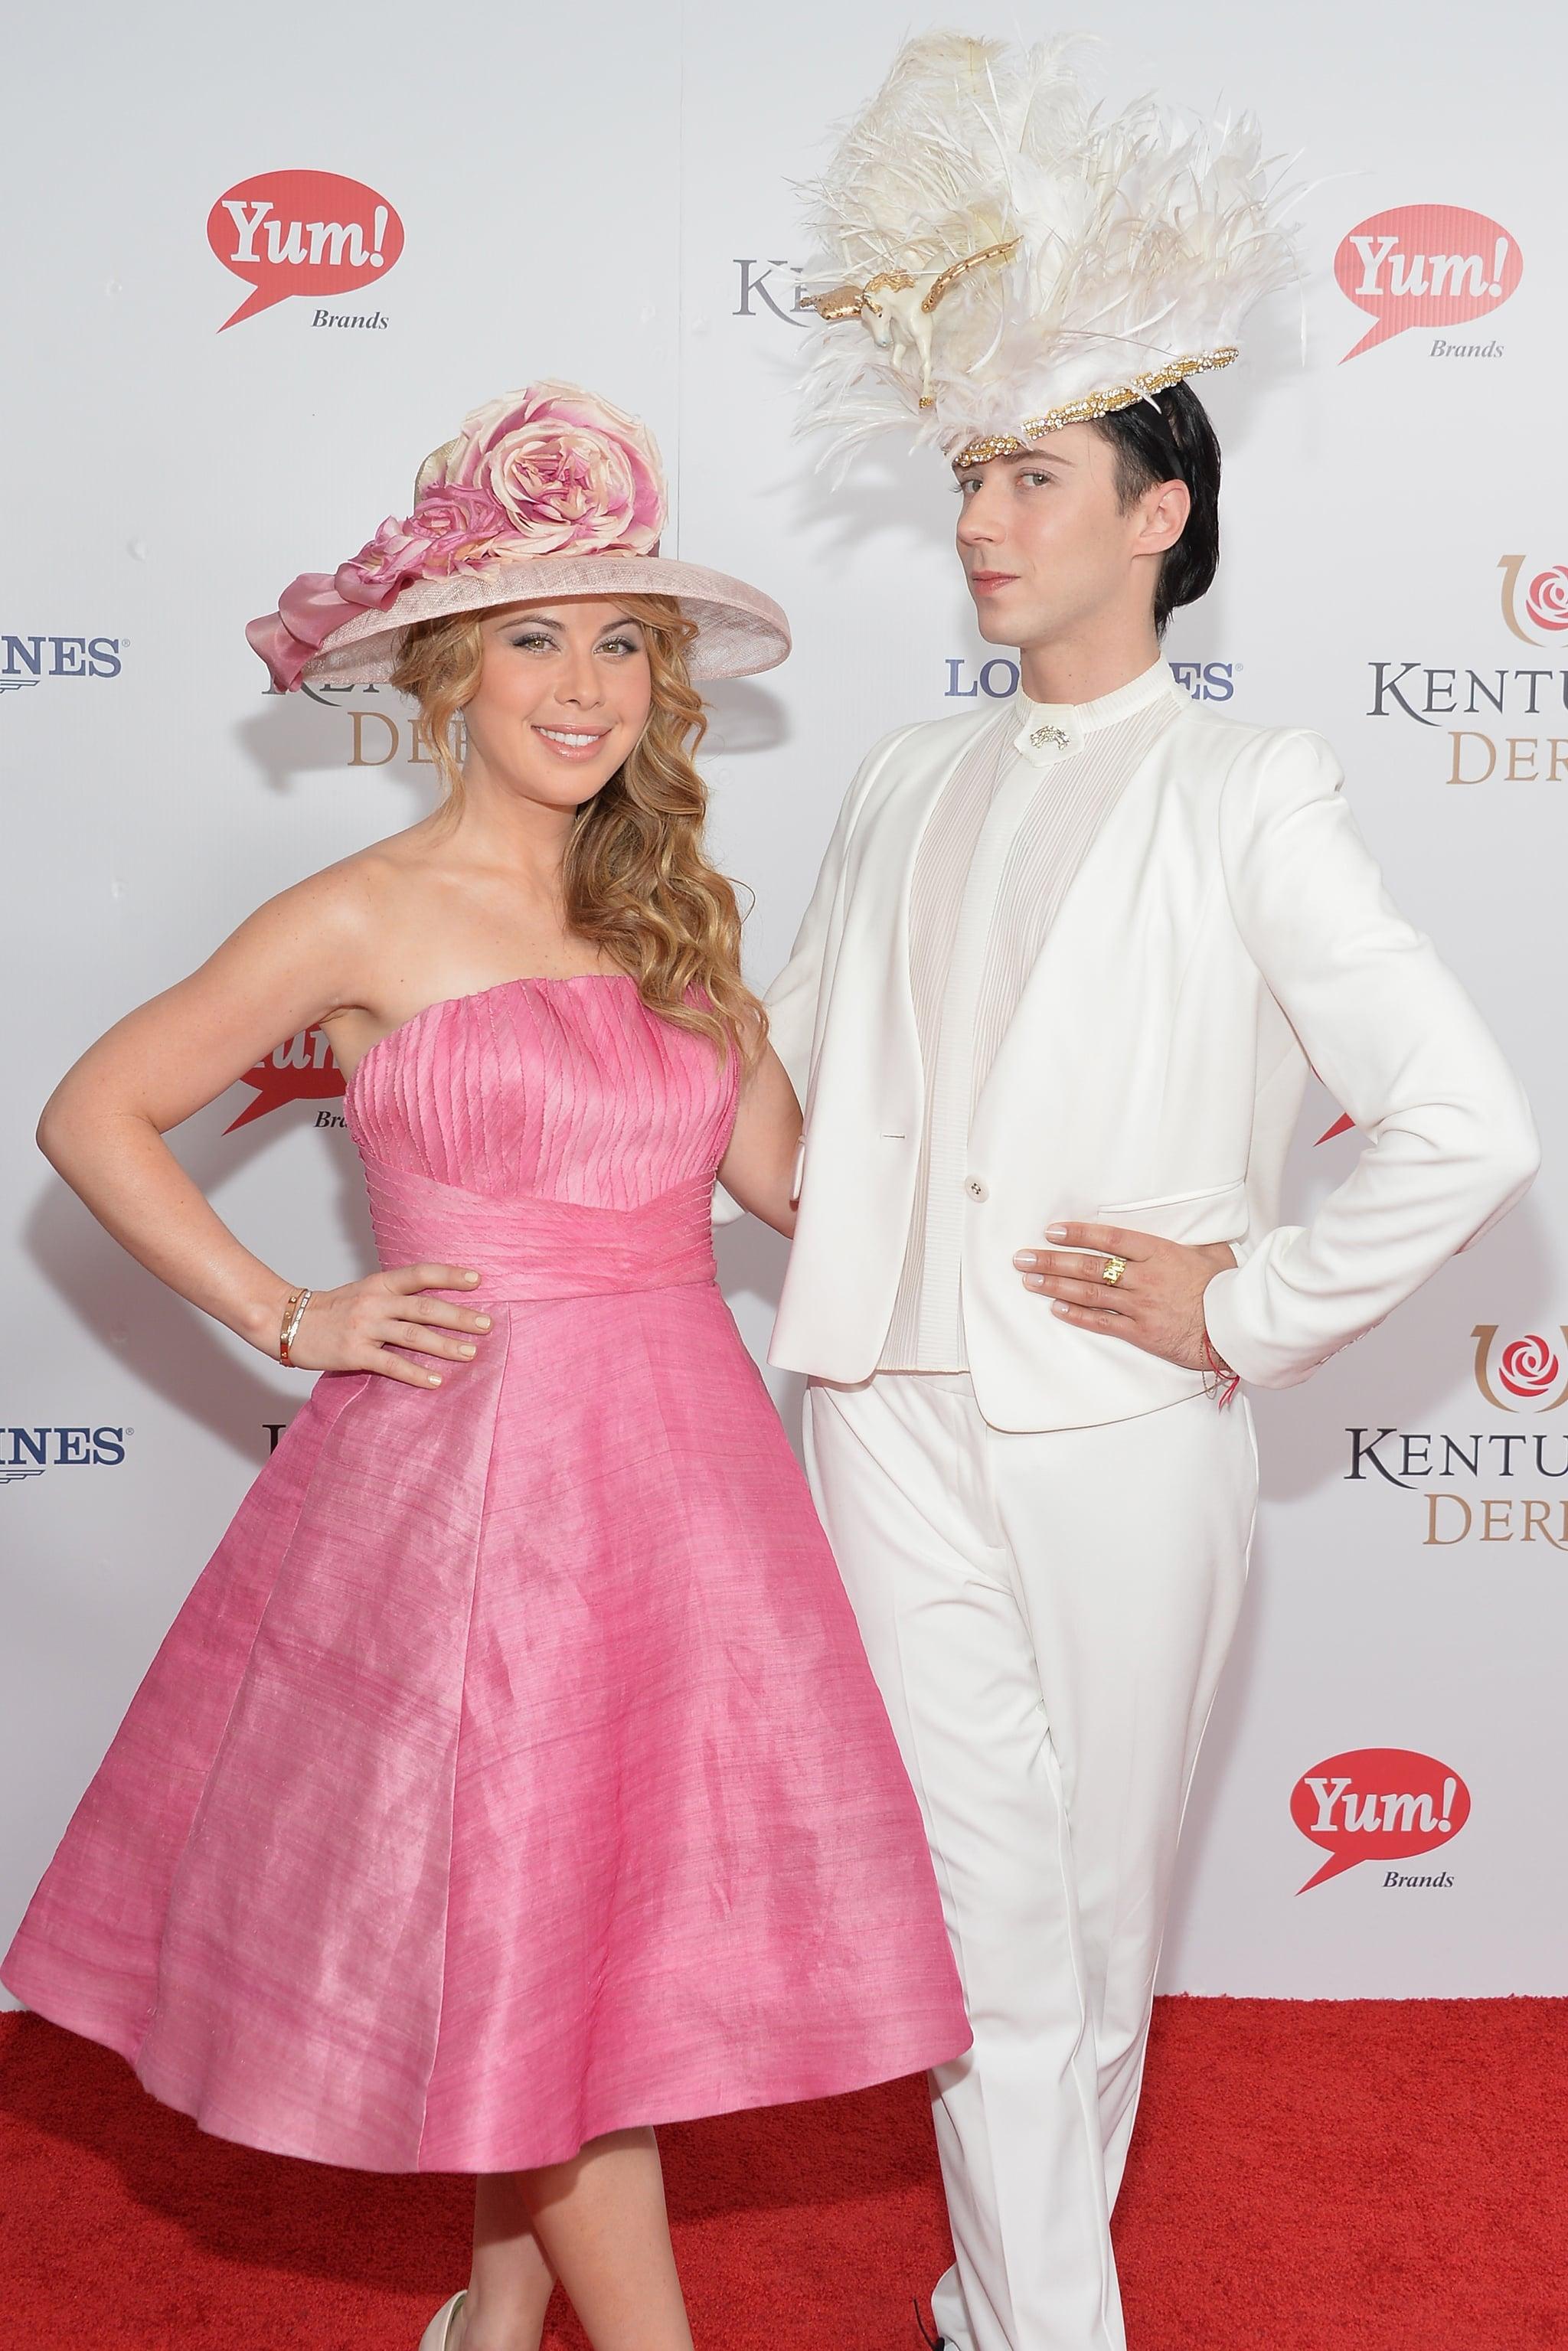 Tara Lipinski and Johnny Weir both had fun with their extravagant hats.